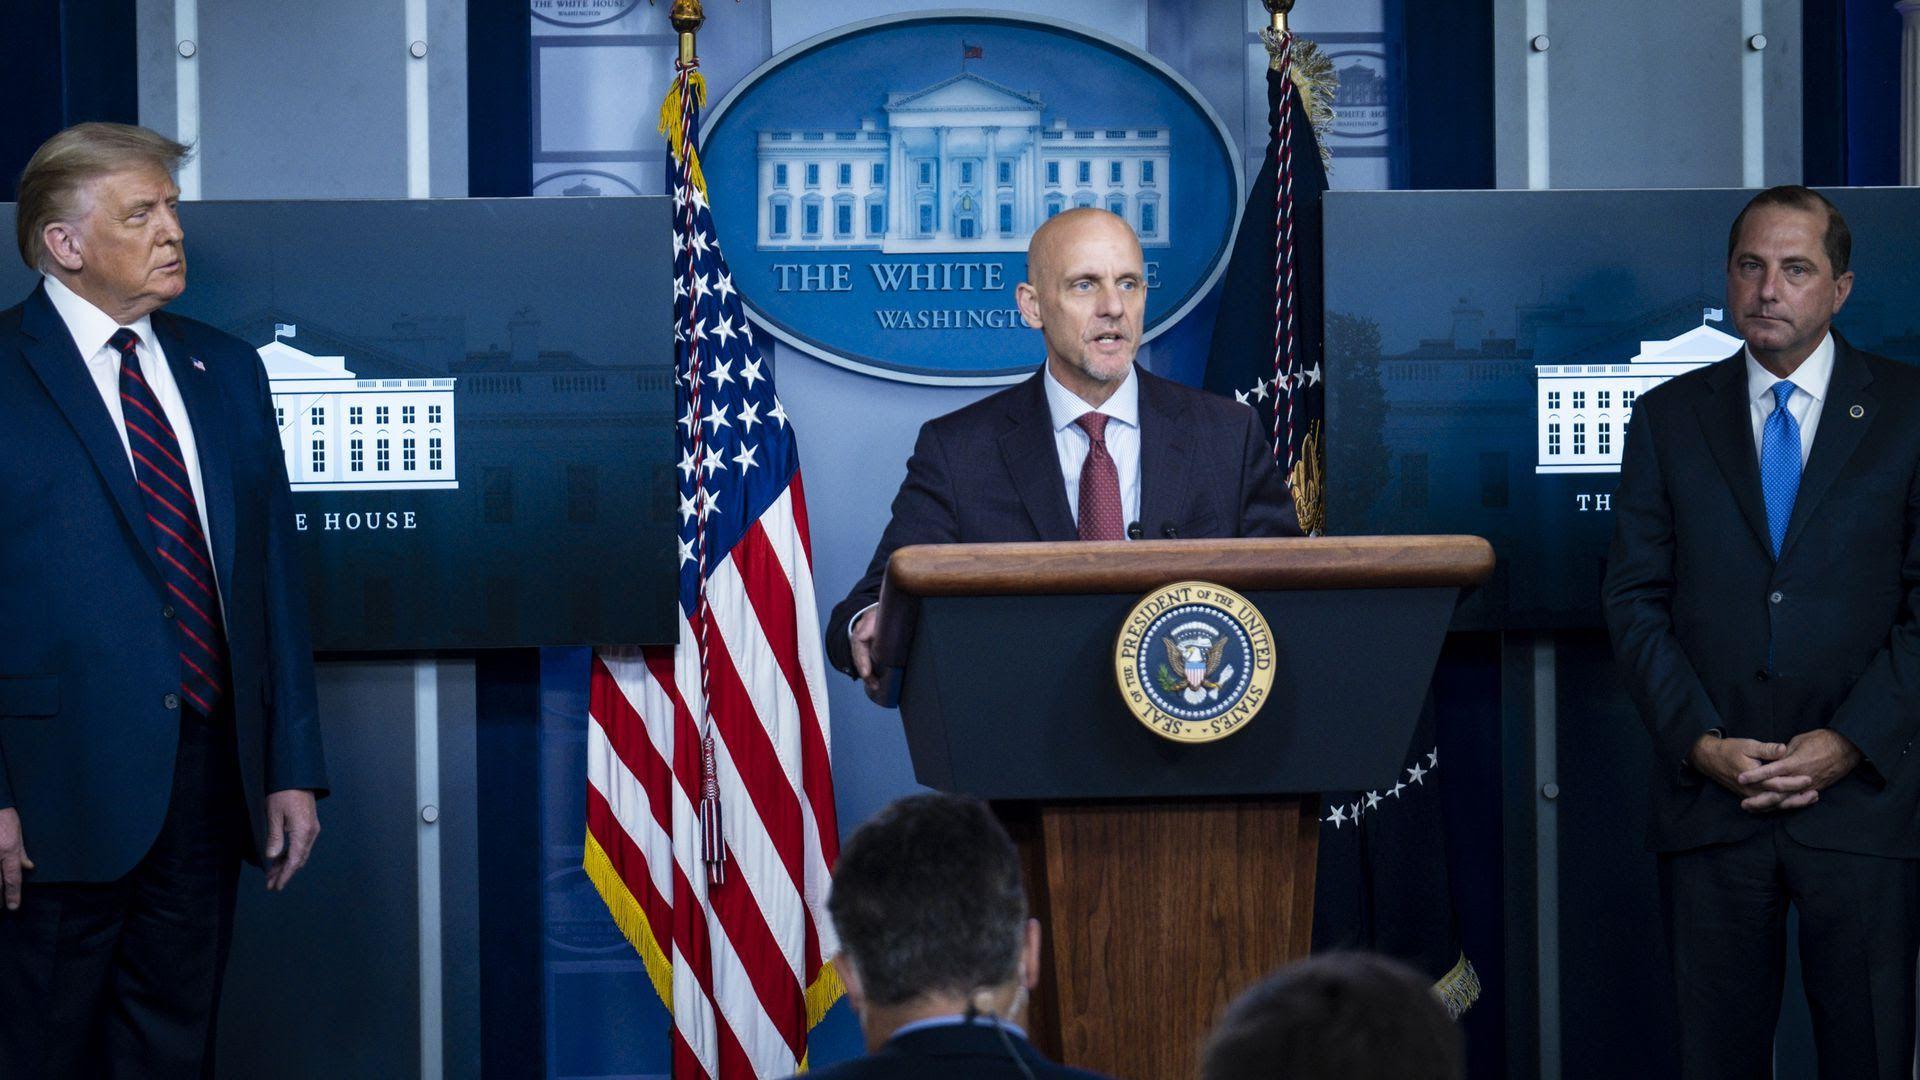 President Trump, FDA commissioner Stephen Hahn and HHS Secretary Alex Azar. Photo: Pete Marovich/Getty Images